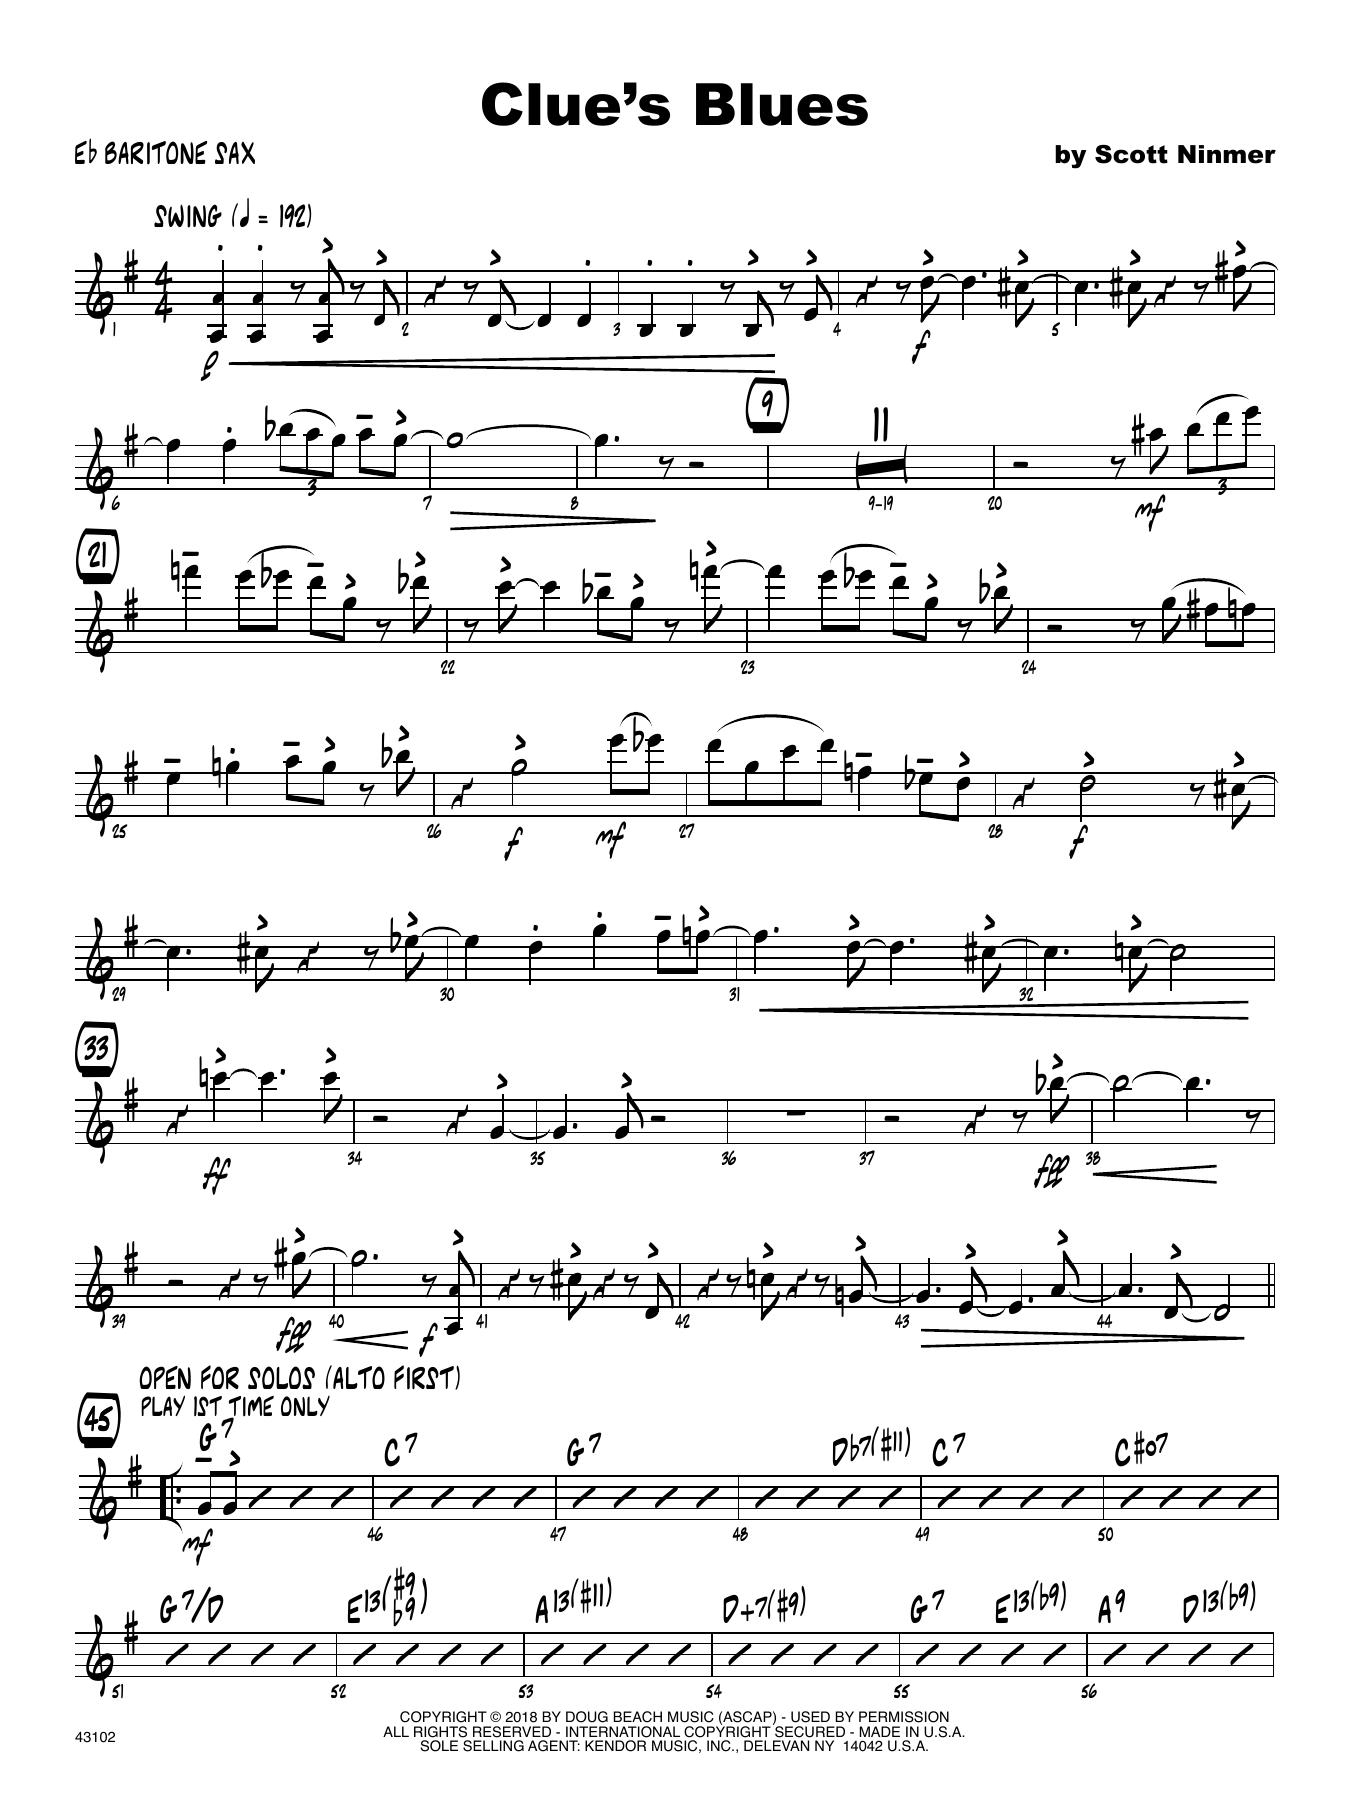 Scott Ninmer Clue's Blues - Eb Baritone Saxophone sheet music notes printable PDF score